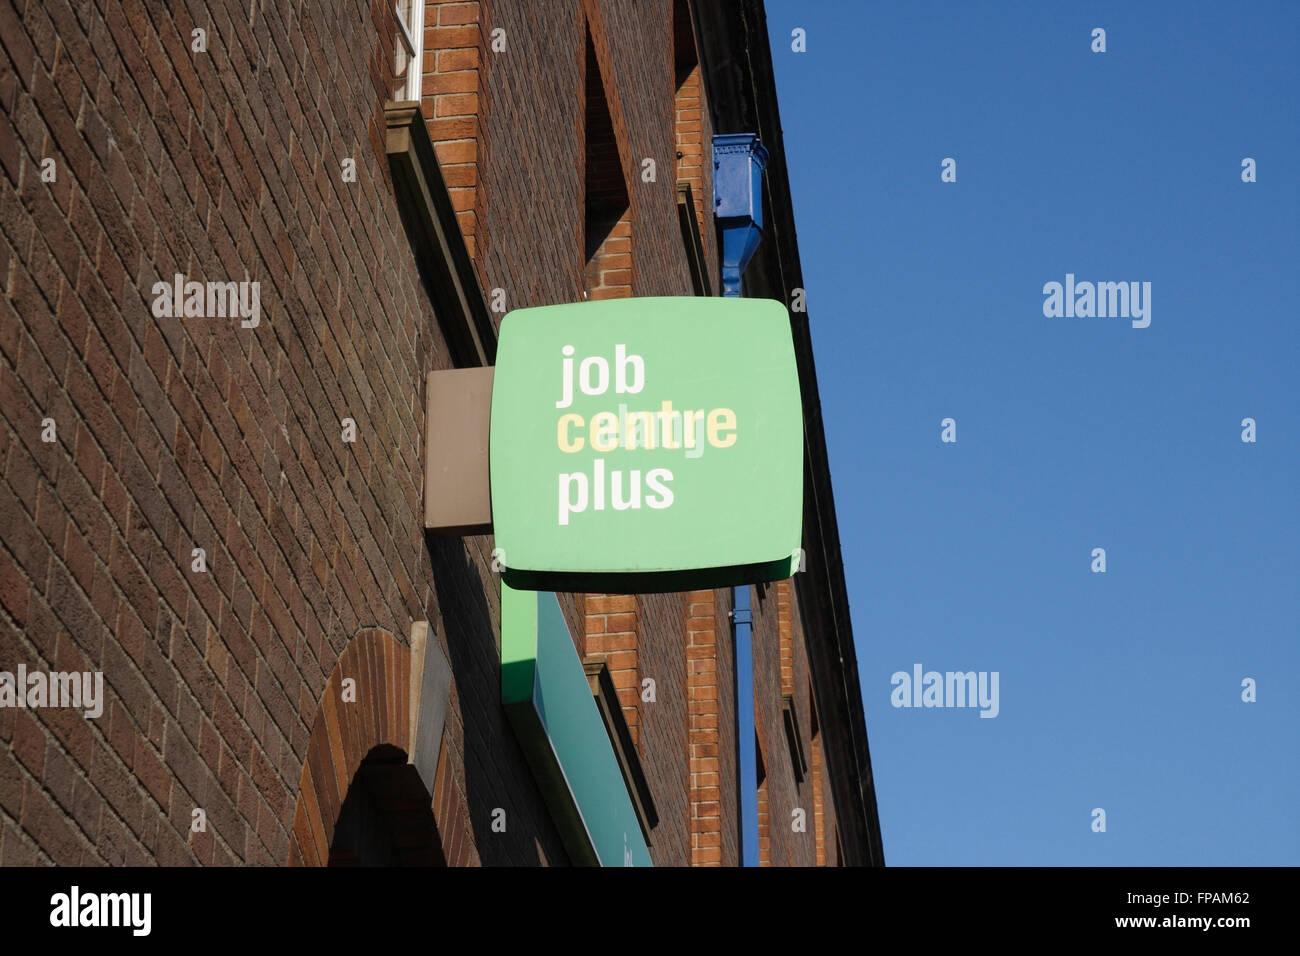 Job centre plus sign on building Stock Photo